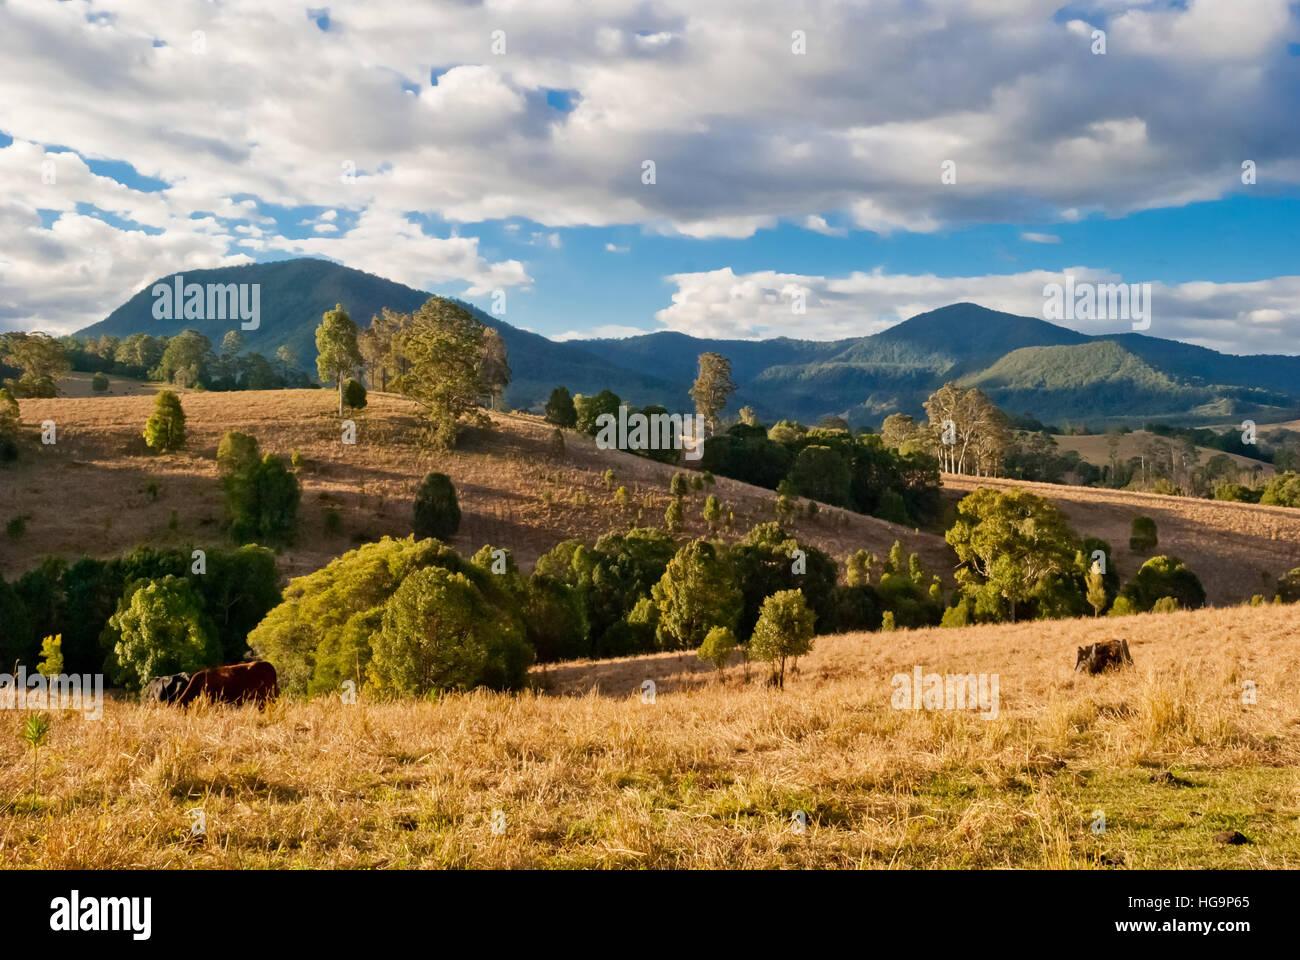 Nimbin, Australia, rural landscape - Stock Image